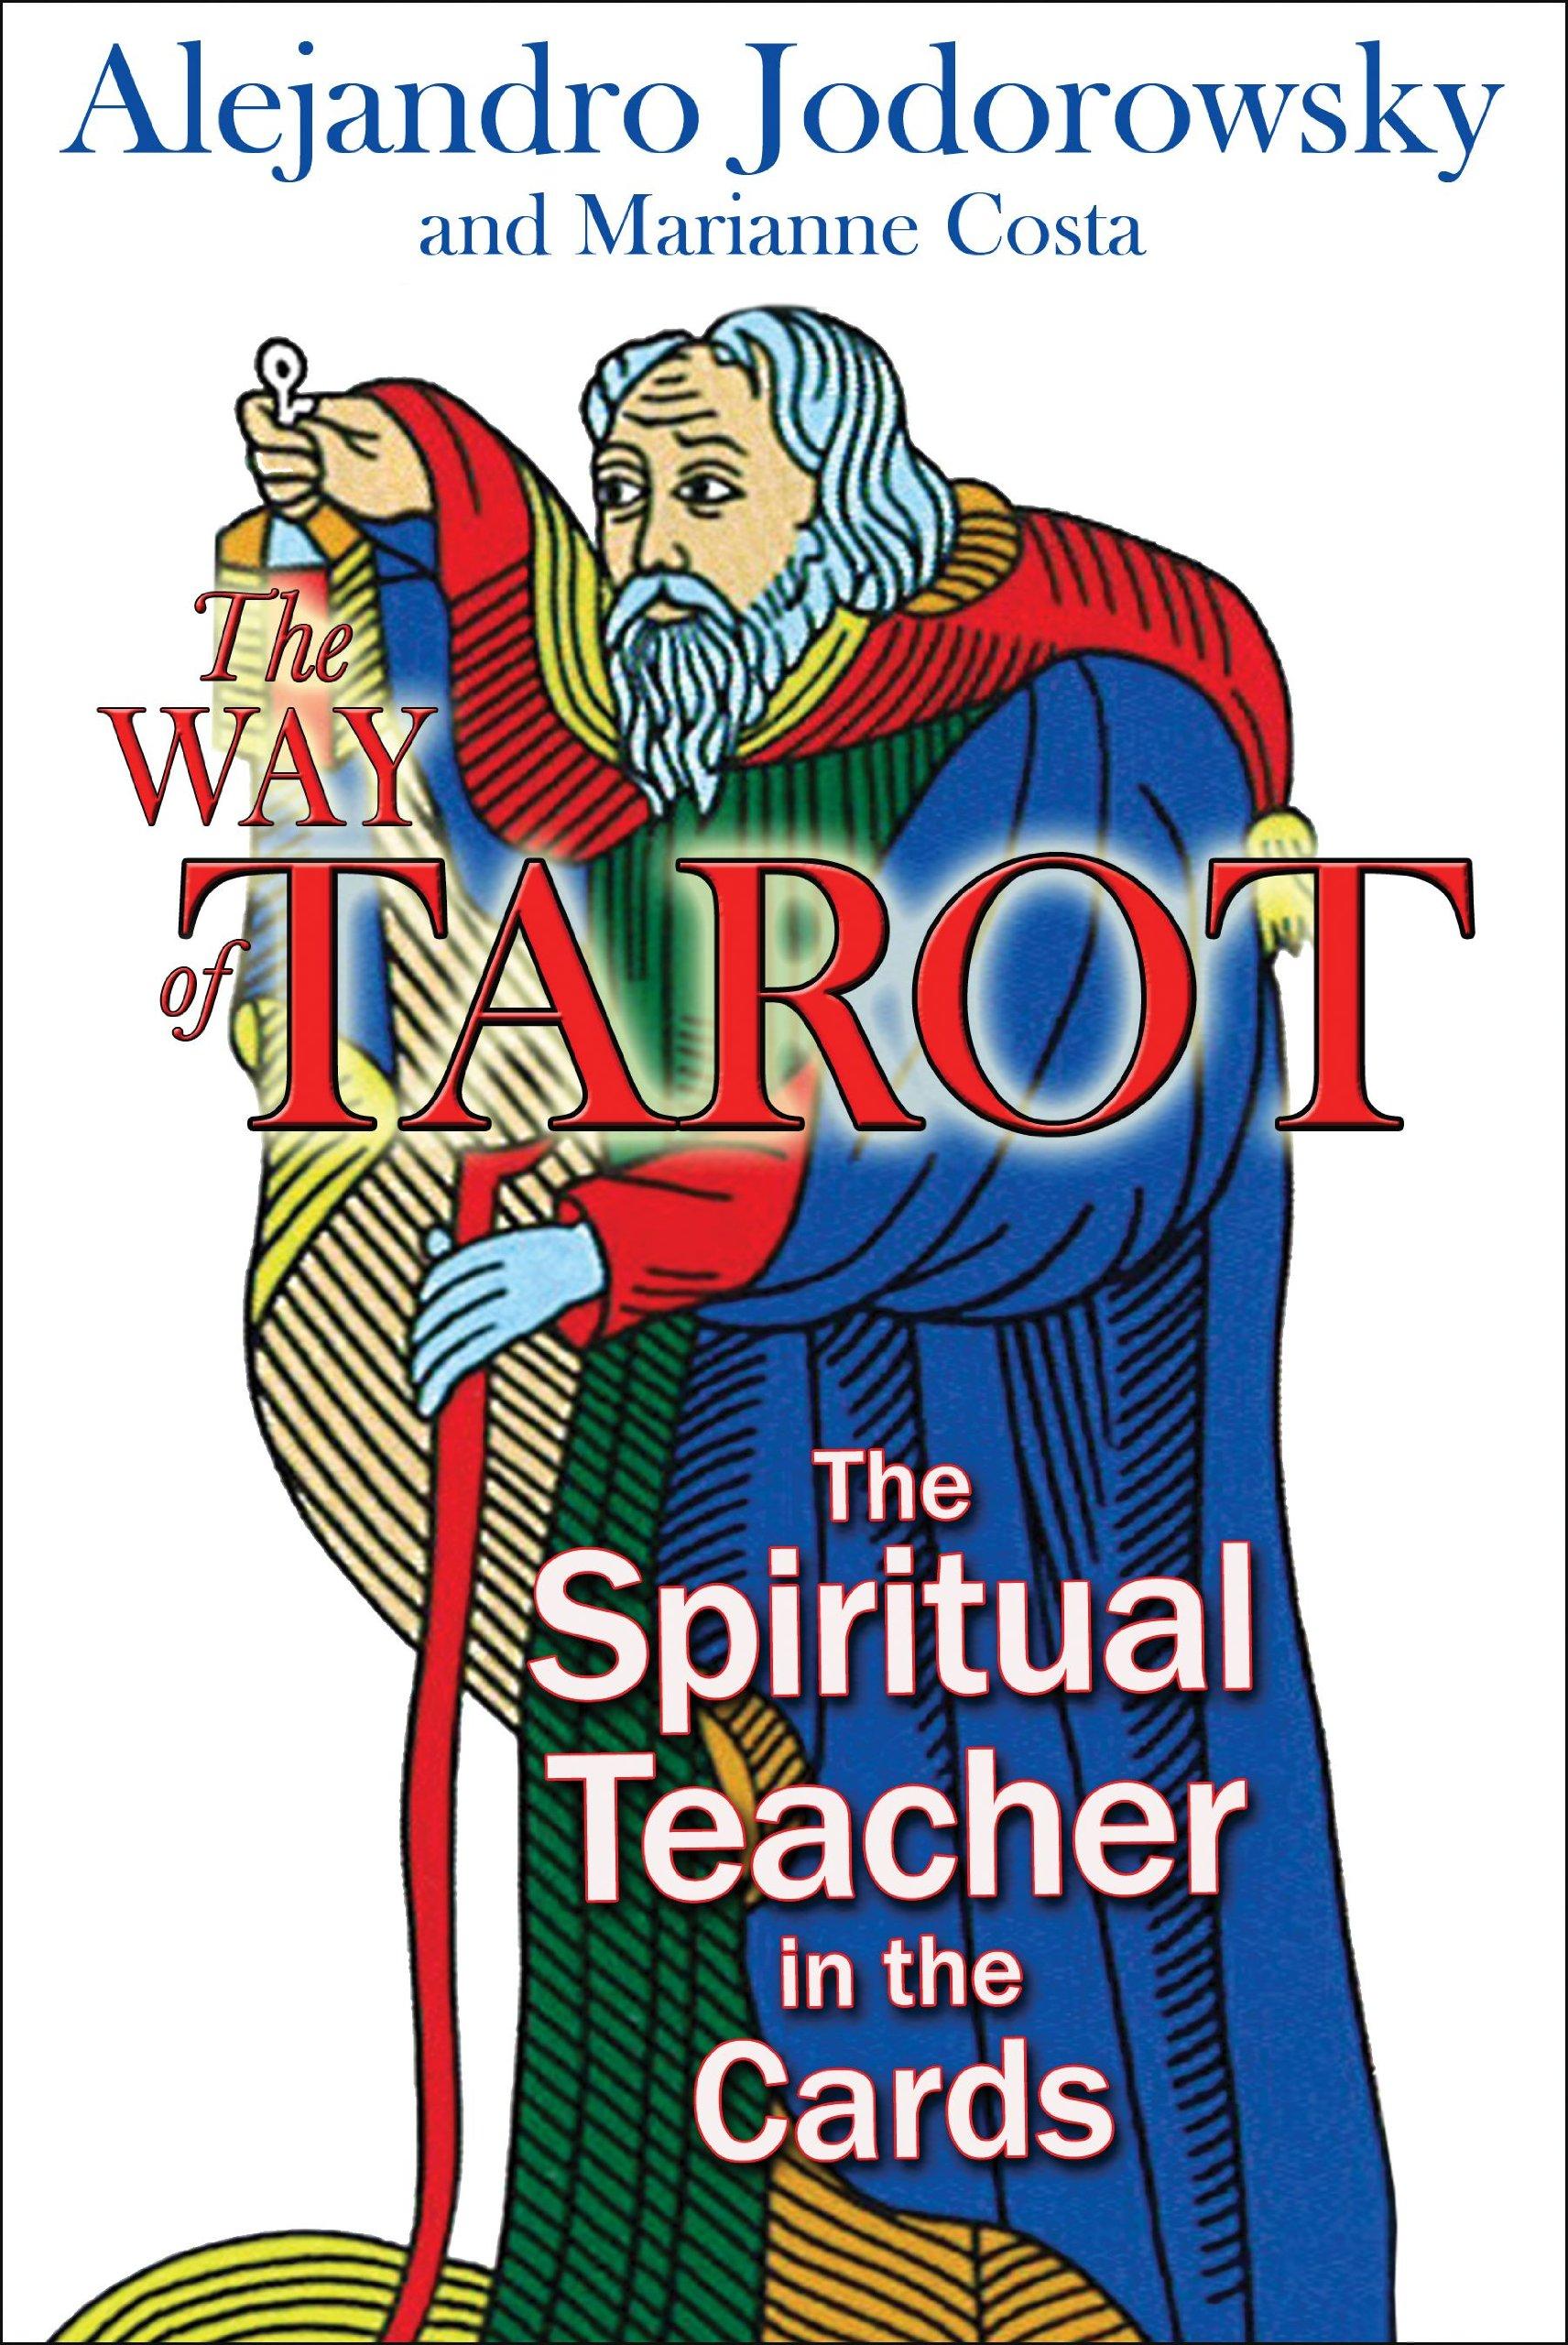 The Way of Tarot: The Spiritual Teacher in the Cards: Alejandro